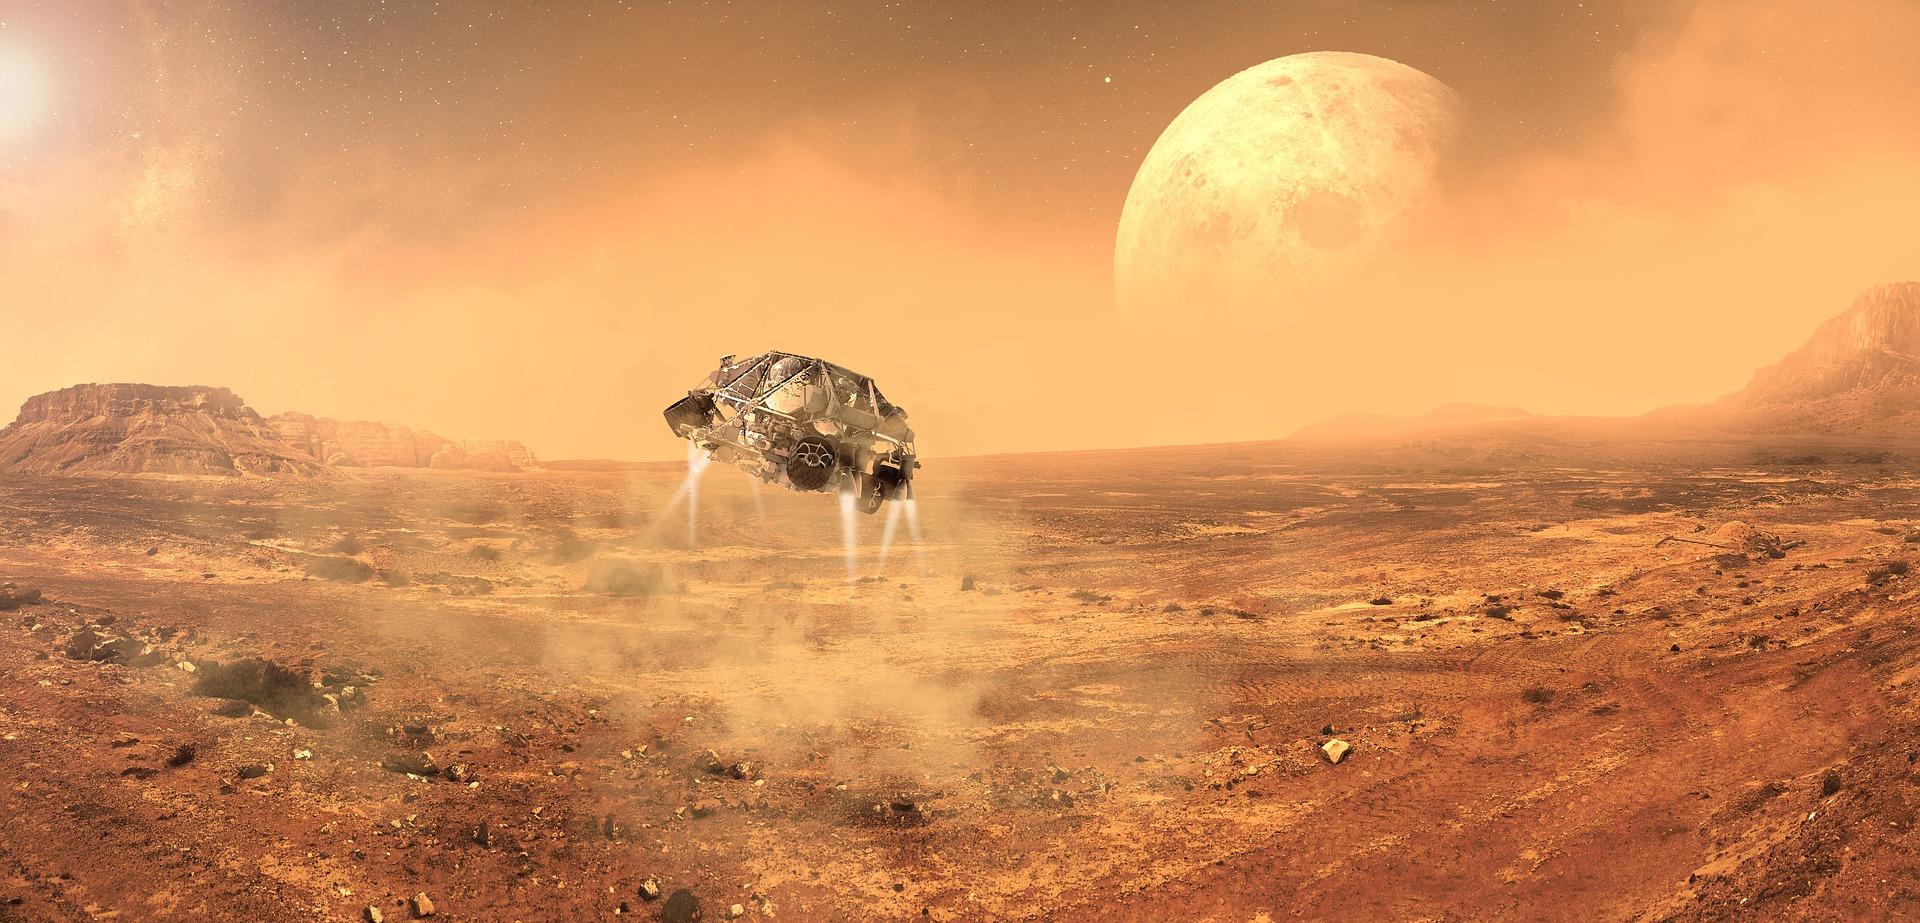 Tecnologia enviada a Marte está sendo usada para tratar o solo no agro brasileiro